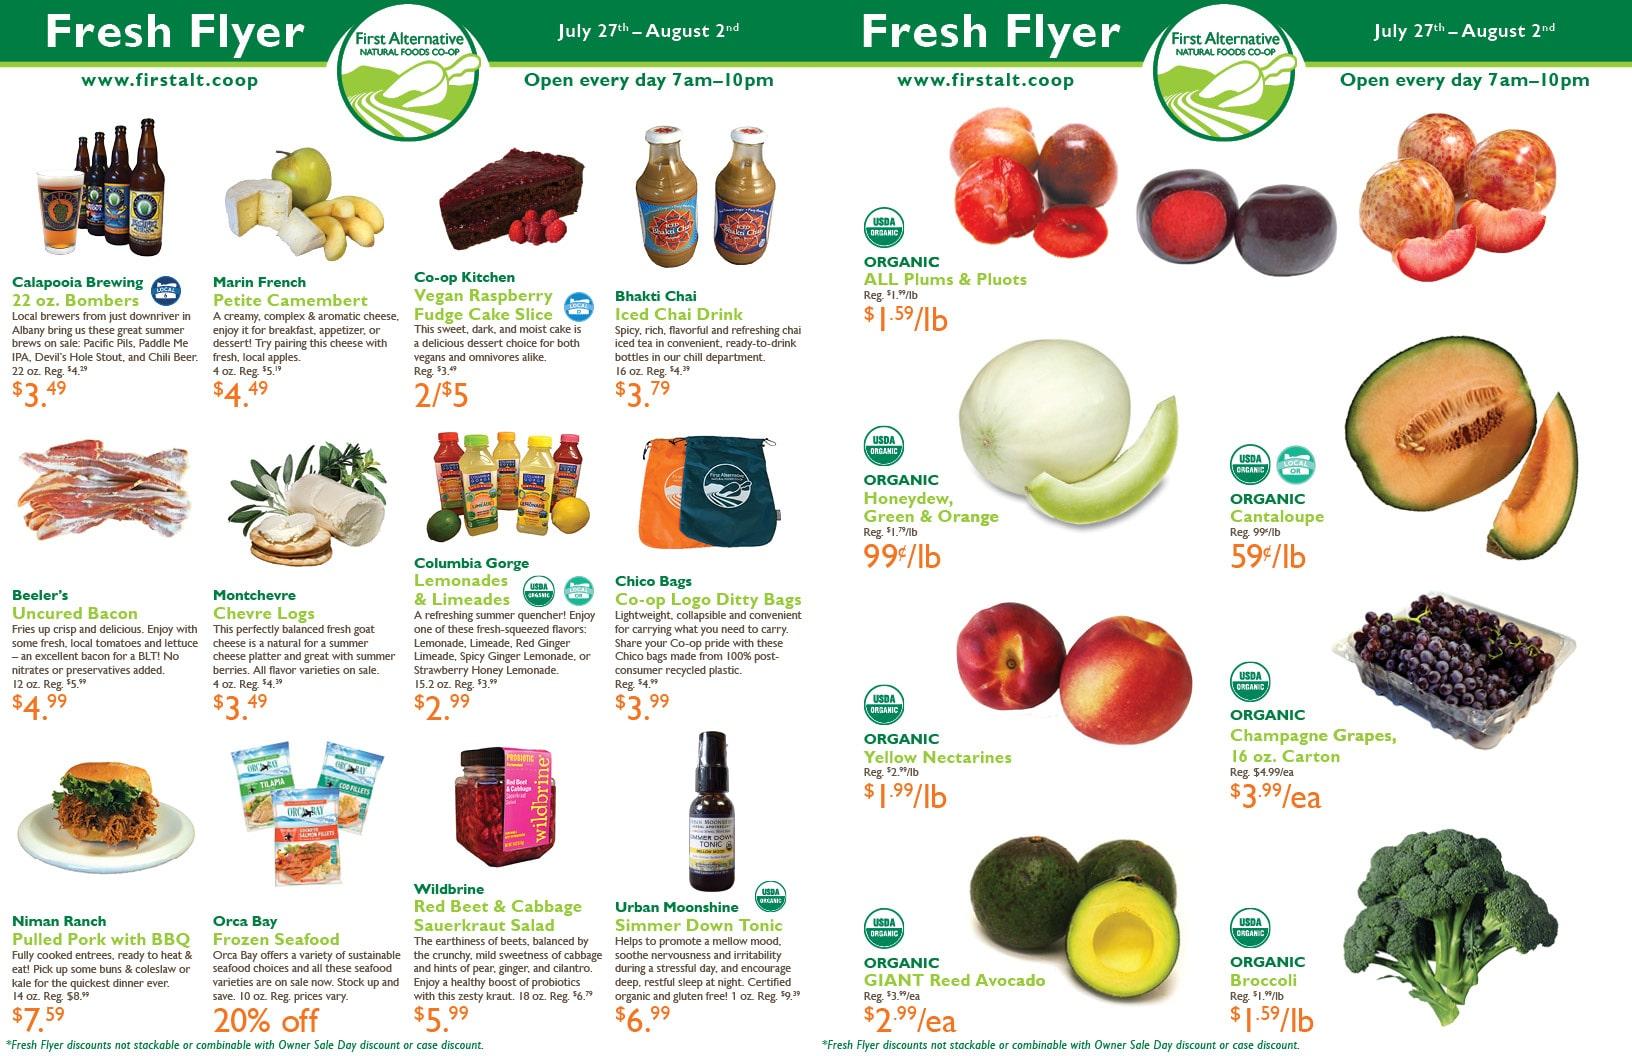 First Alternative Fresh Flyer July 27-Aug 2